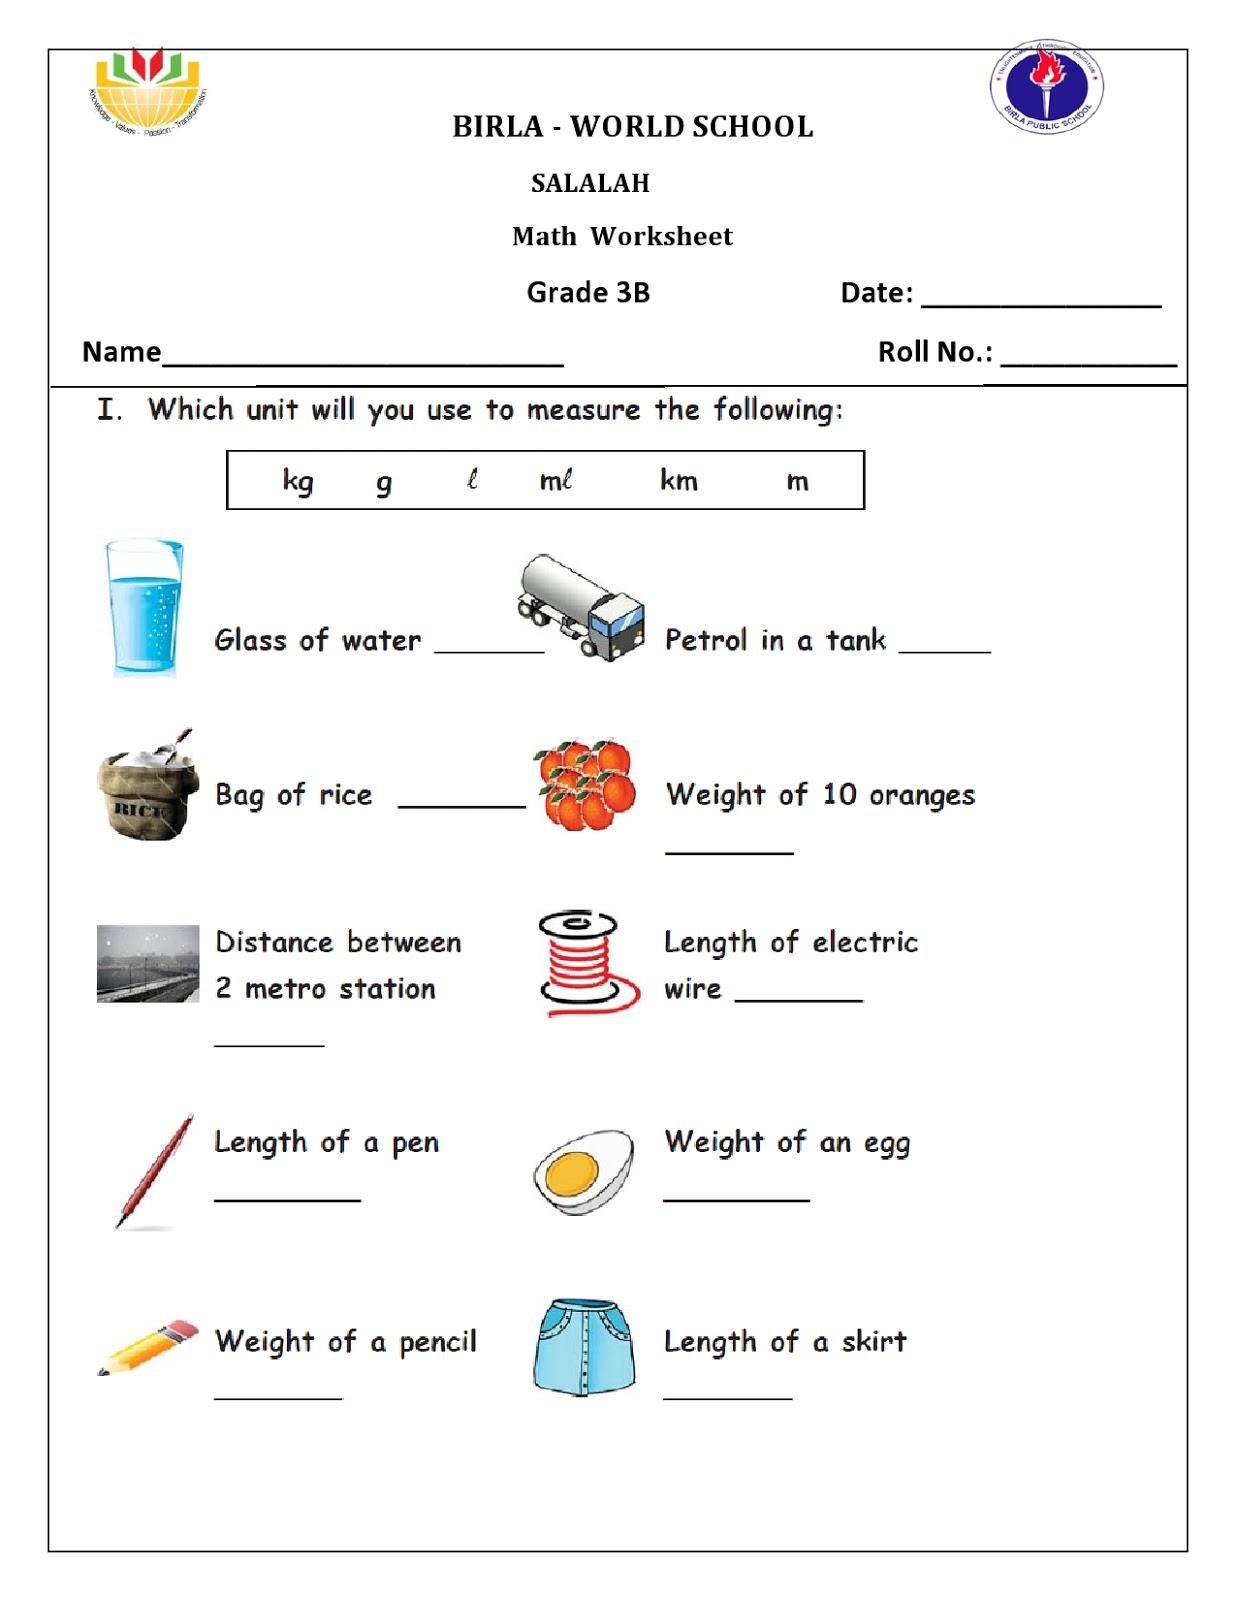 Birla World School Oman Home Work For Grade 3b On 21 01 16